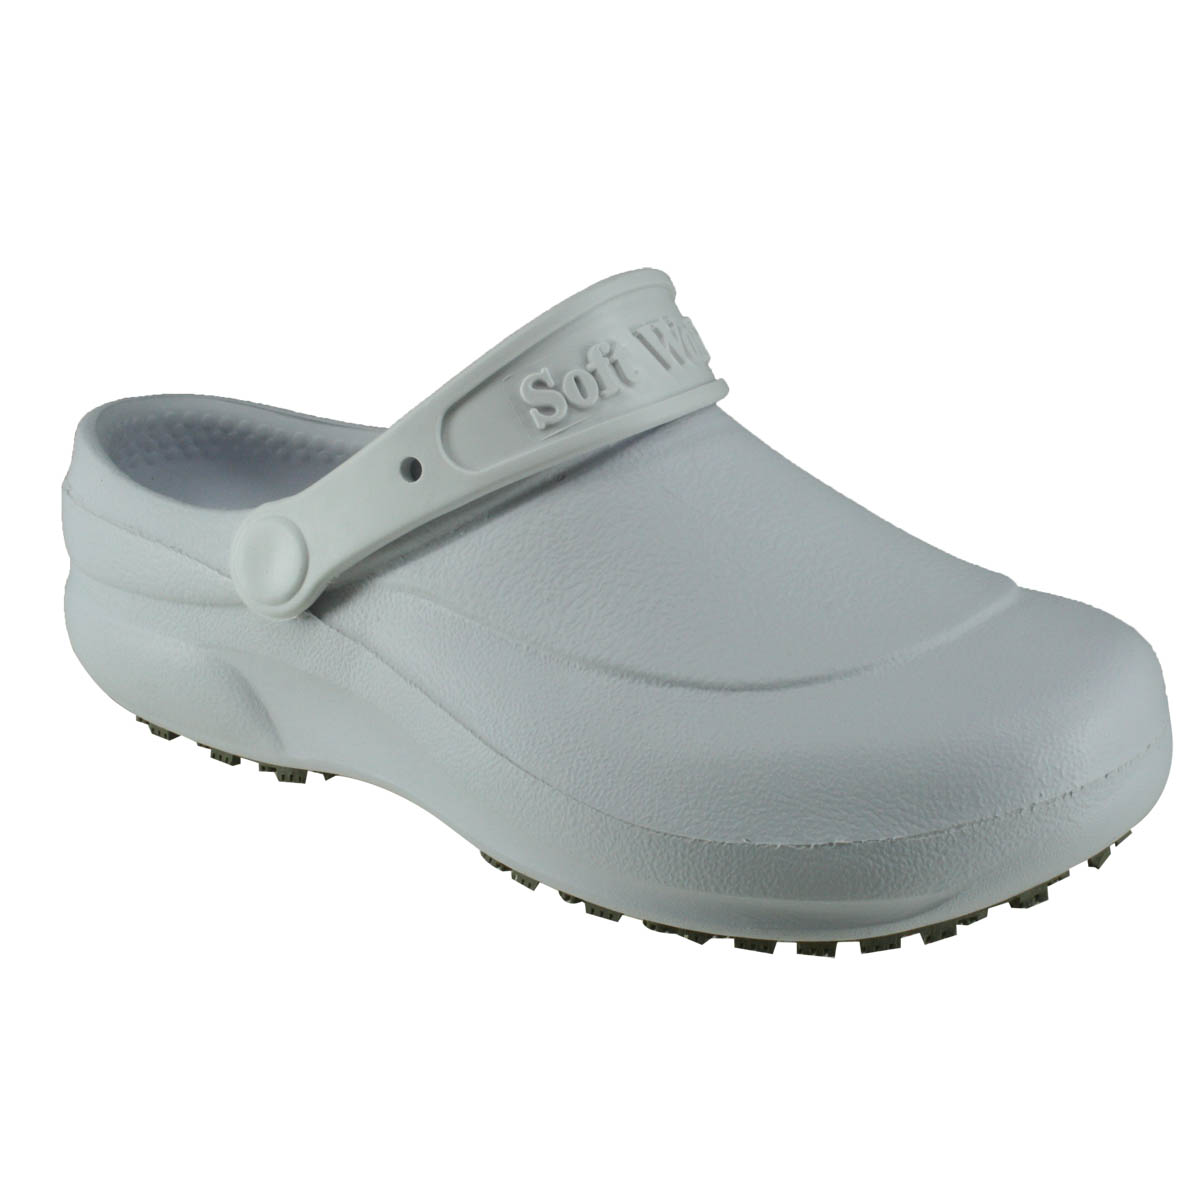 8a28bcae6f Sapato em EVA babuch modelo bb60 branco tipo sandalia soft works